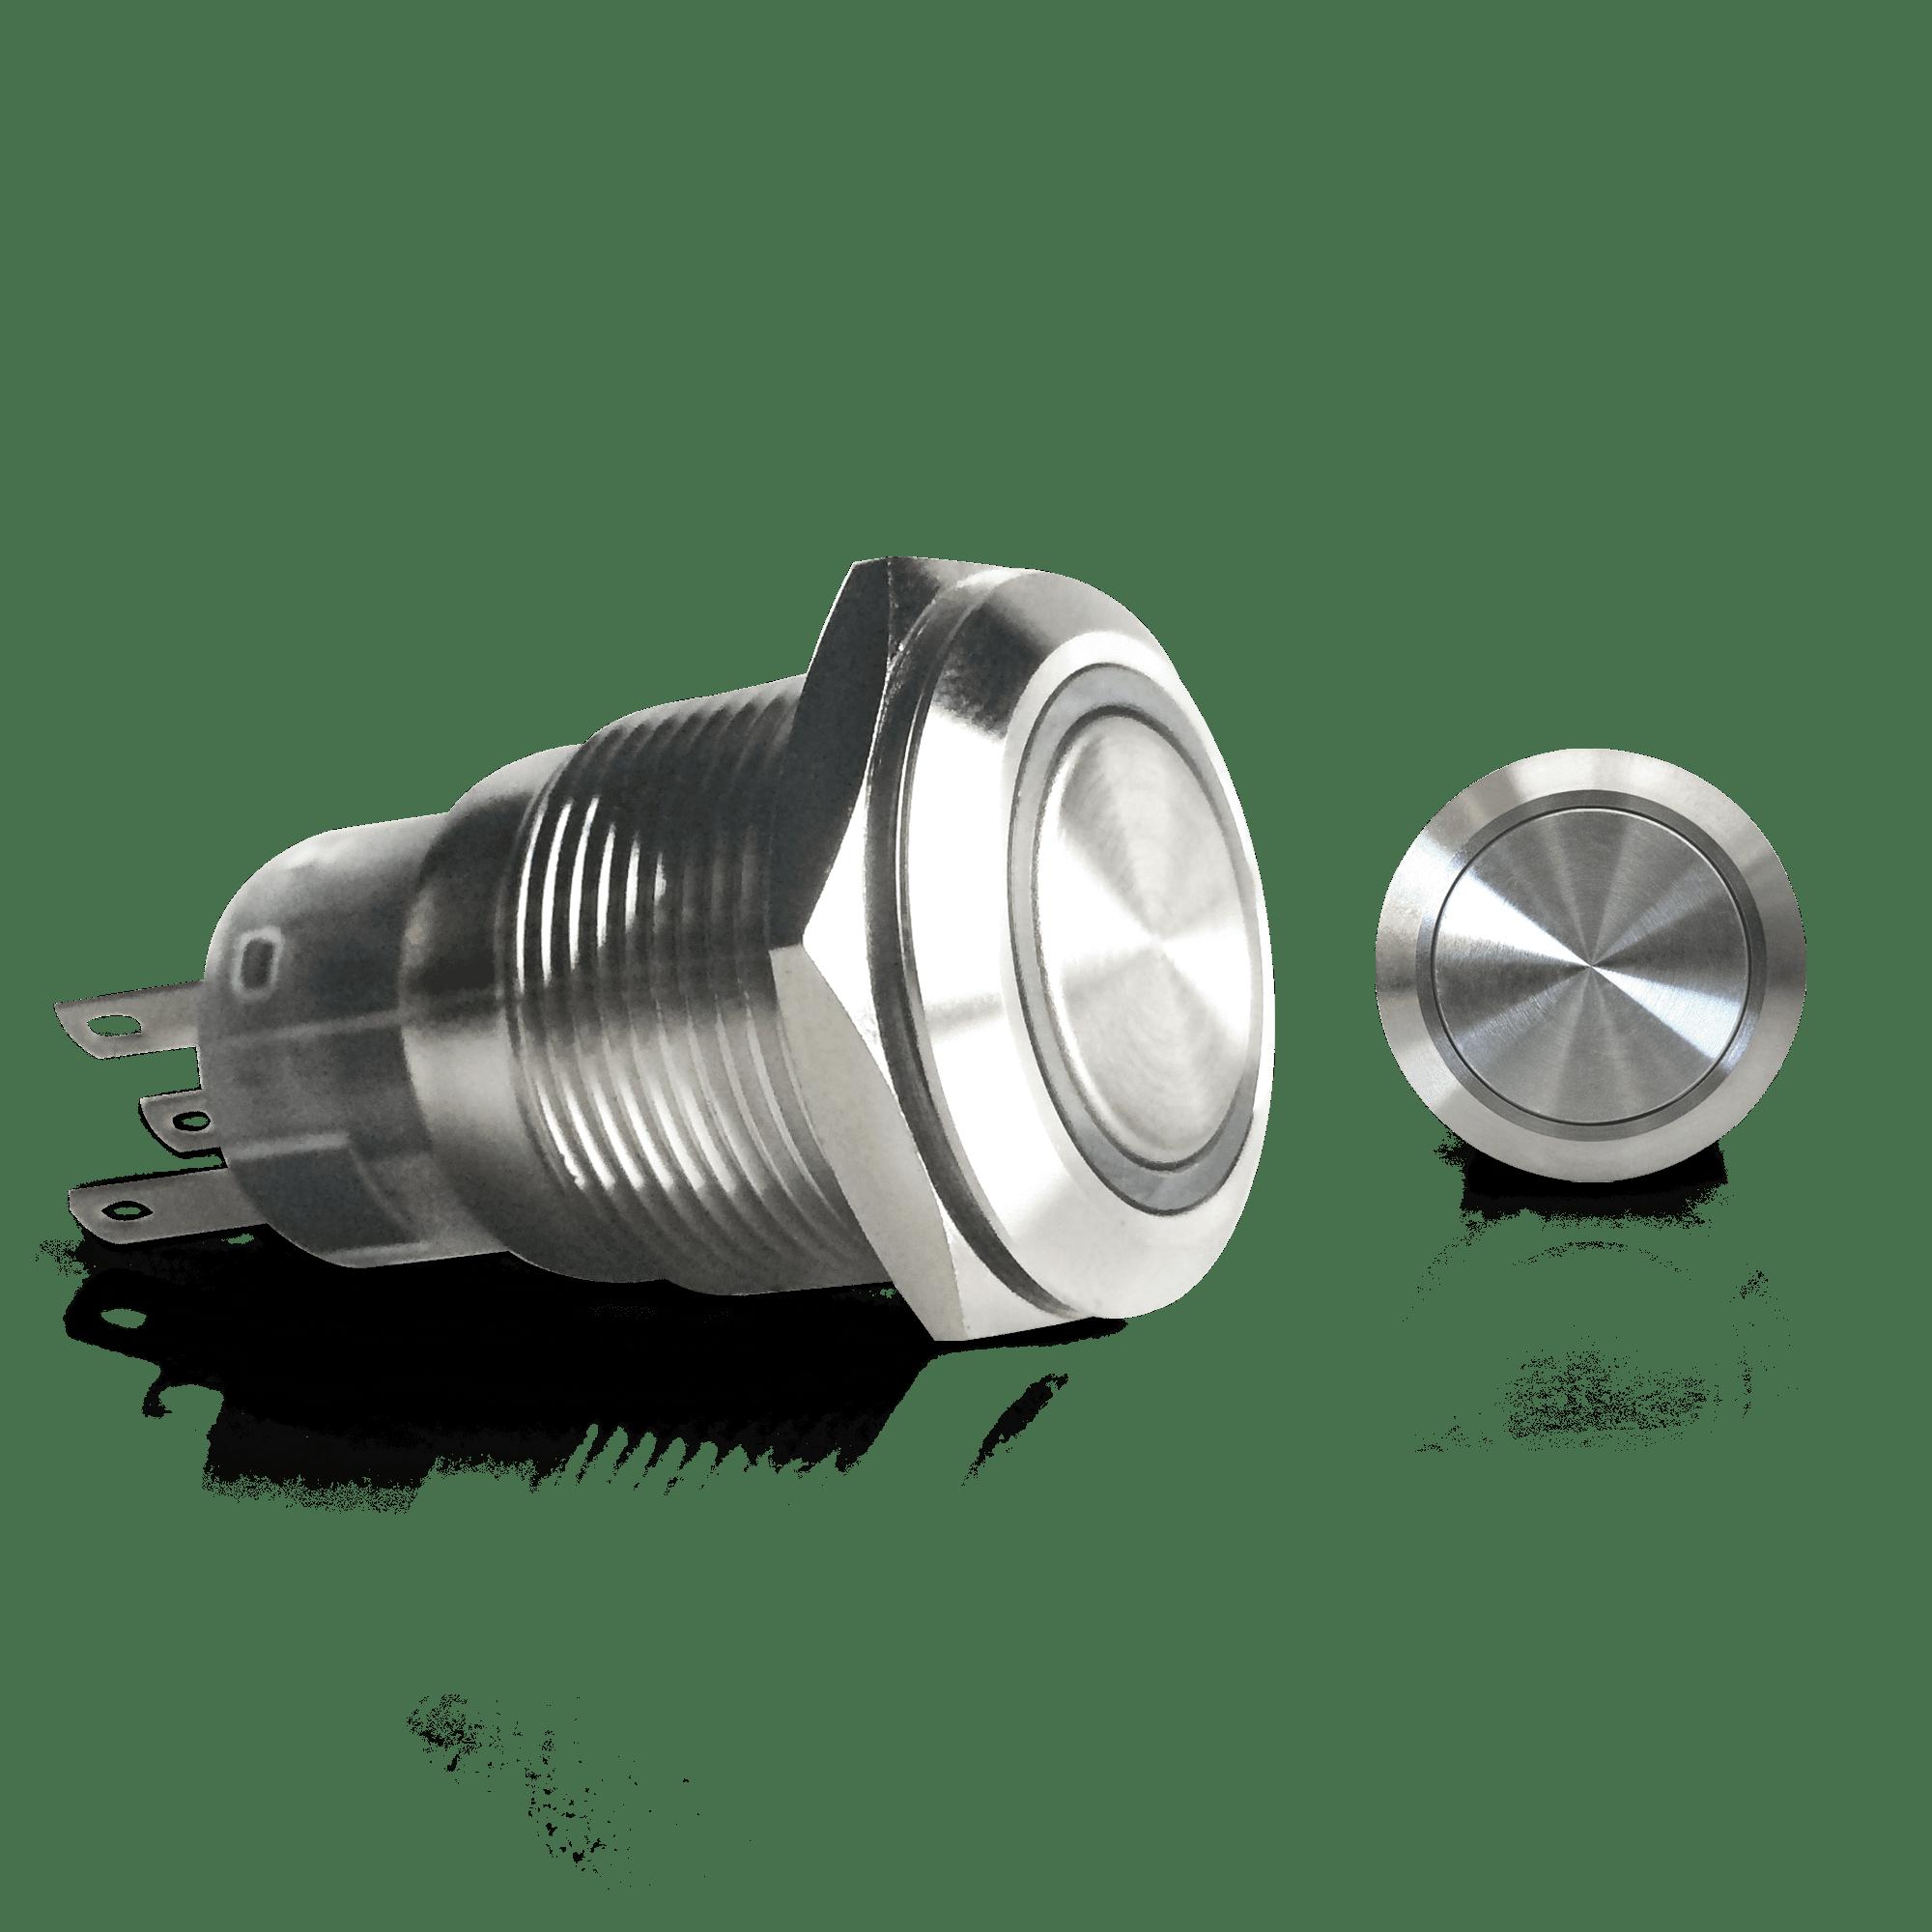 AutoLoc 19mm Latching Billet Button  W/out Illumination